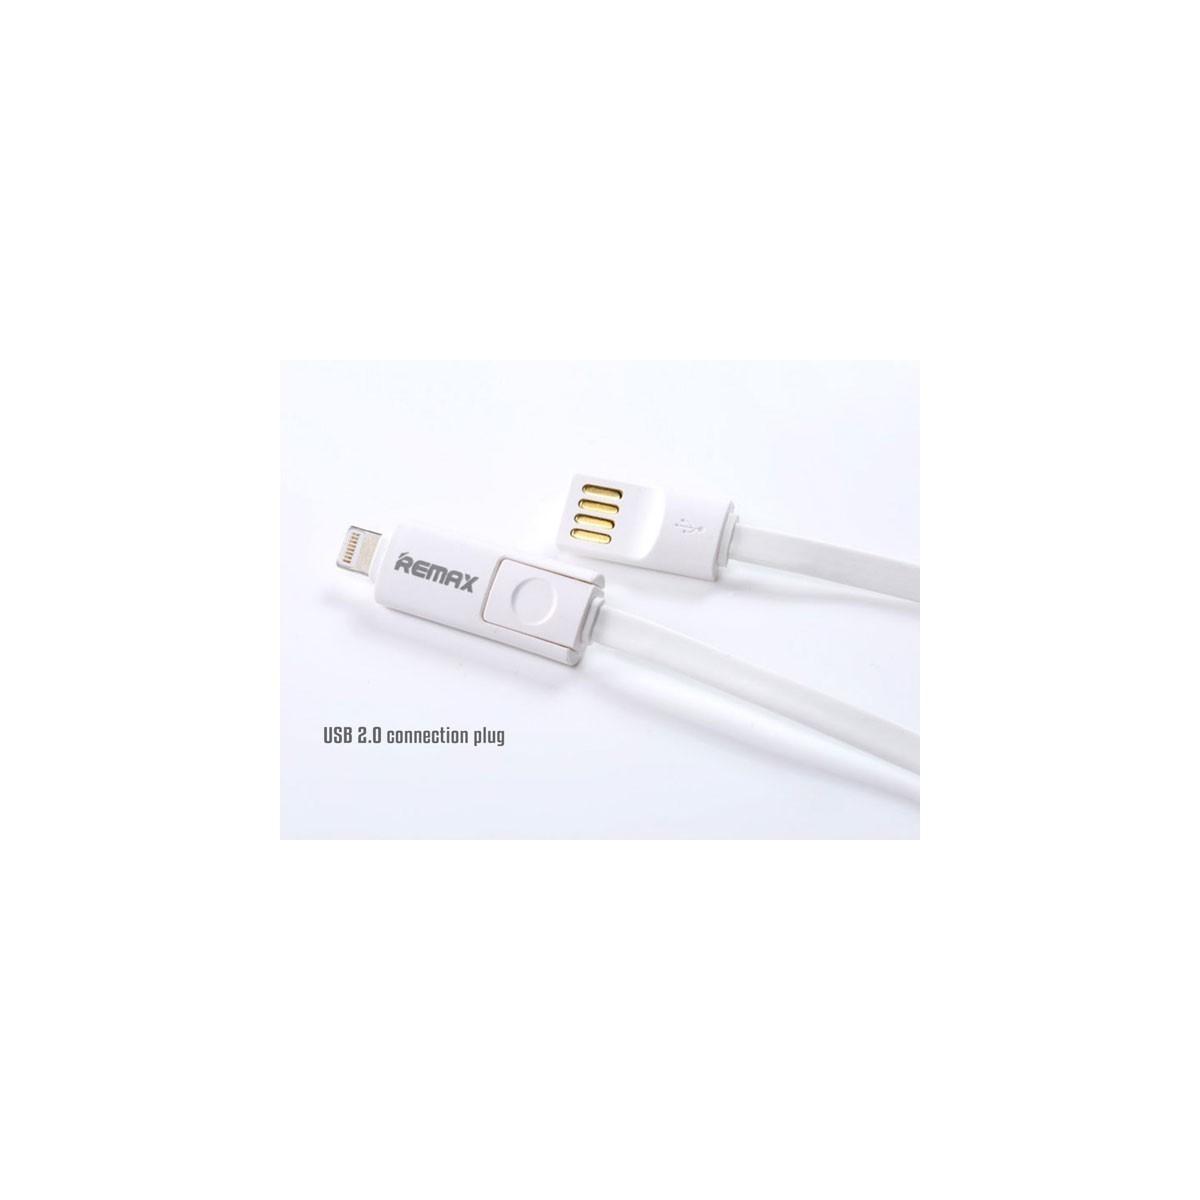 REMAX datový kabel 2 v 1 , Micro USB + lighting iPhon 5/6 1,2 m dlouhý, bílá barva Univerzal